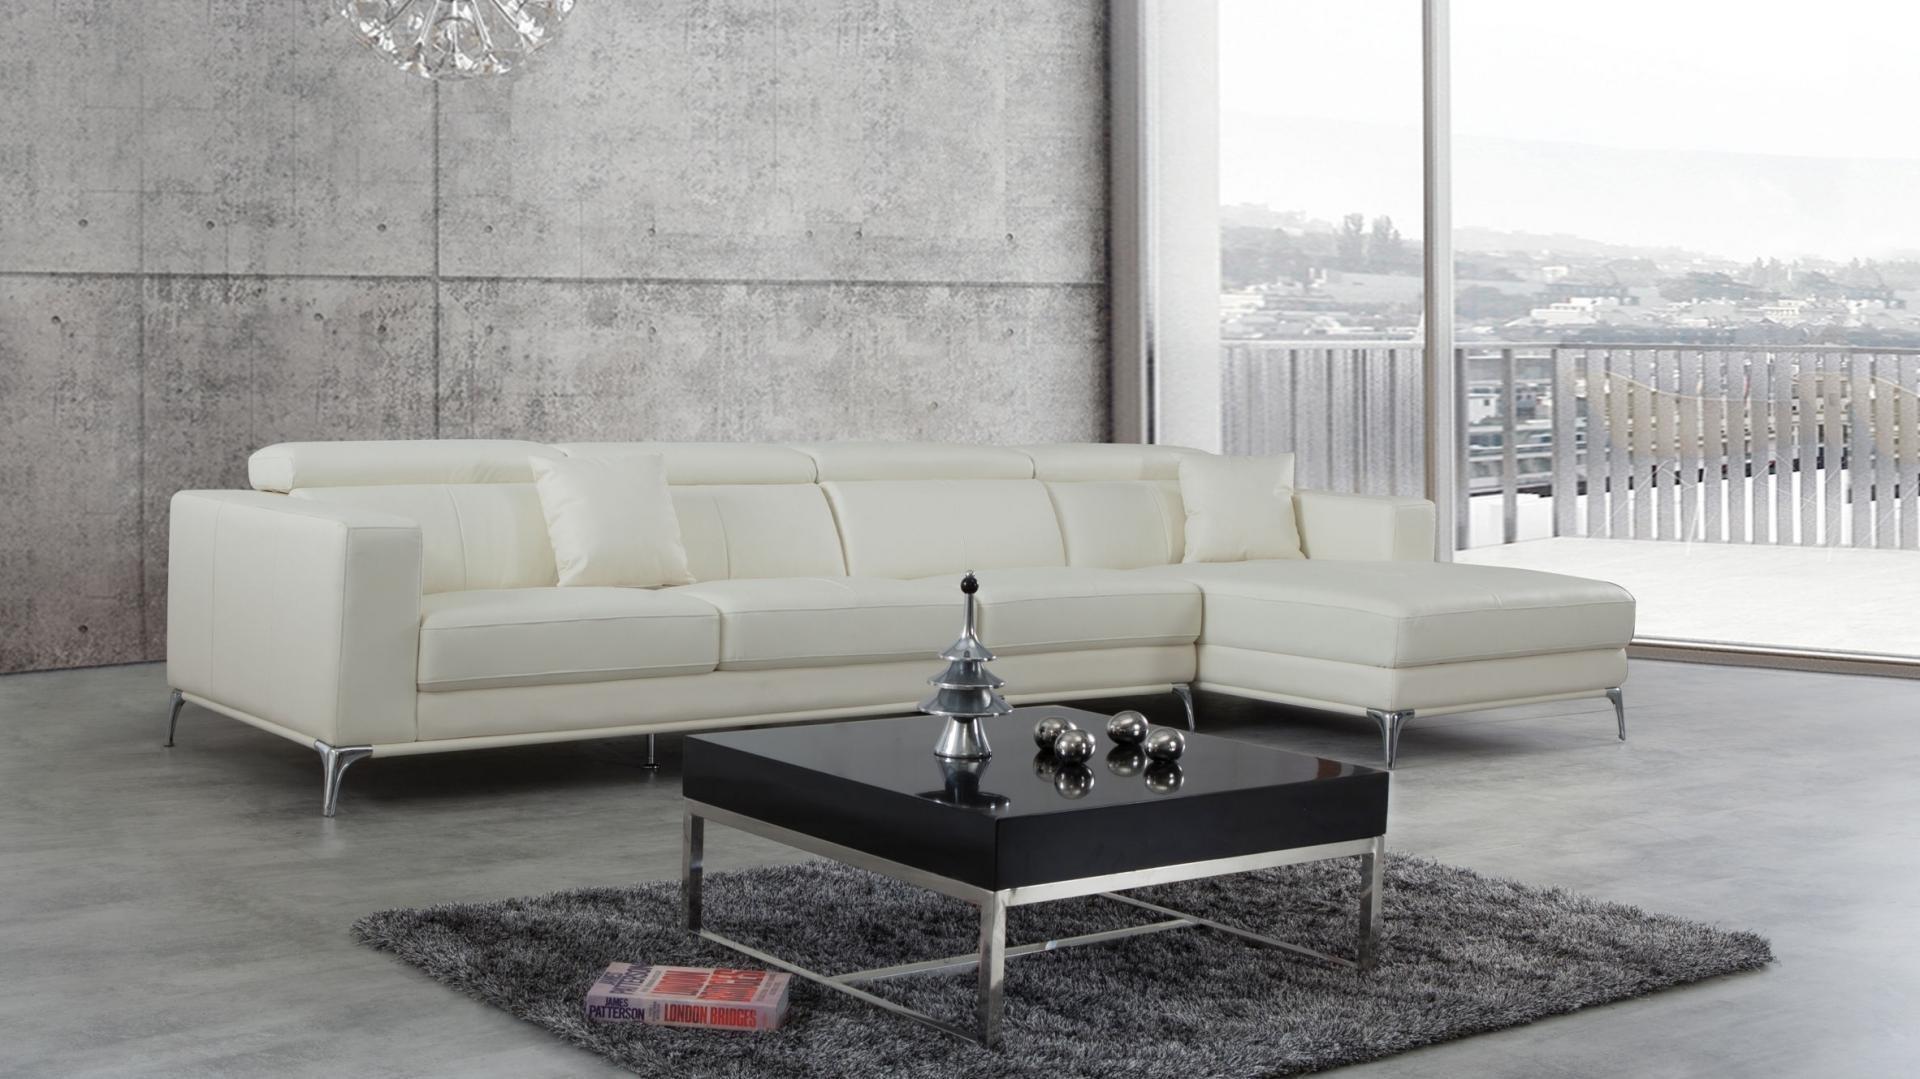 Club Leather Chaise Lounge Option B Lounge Life